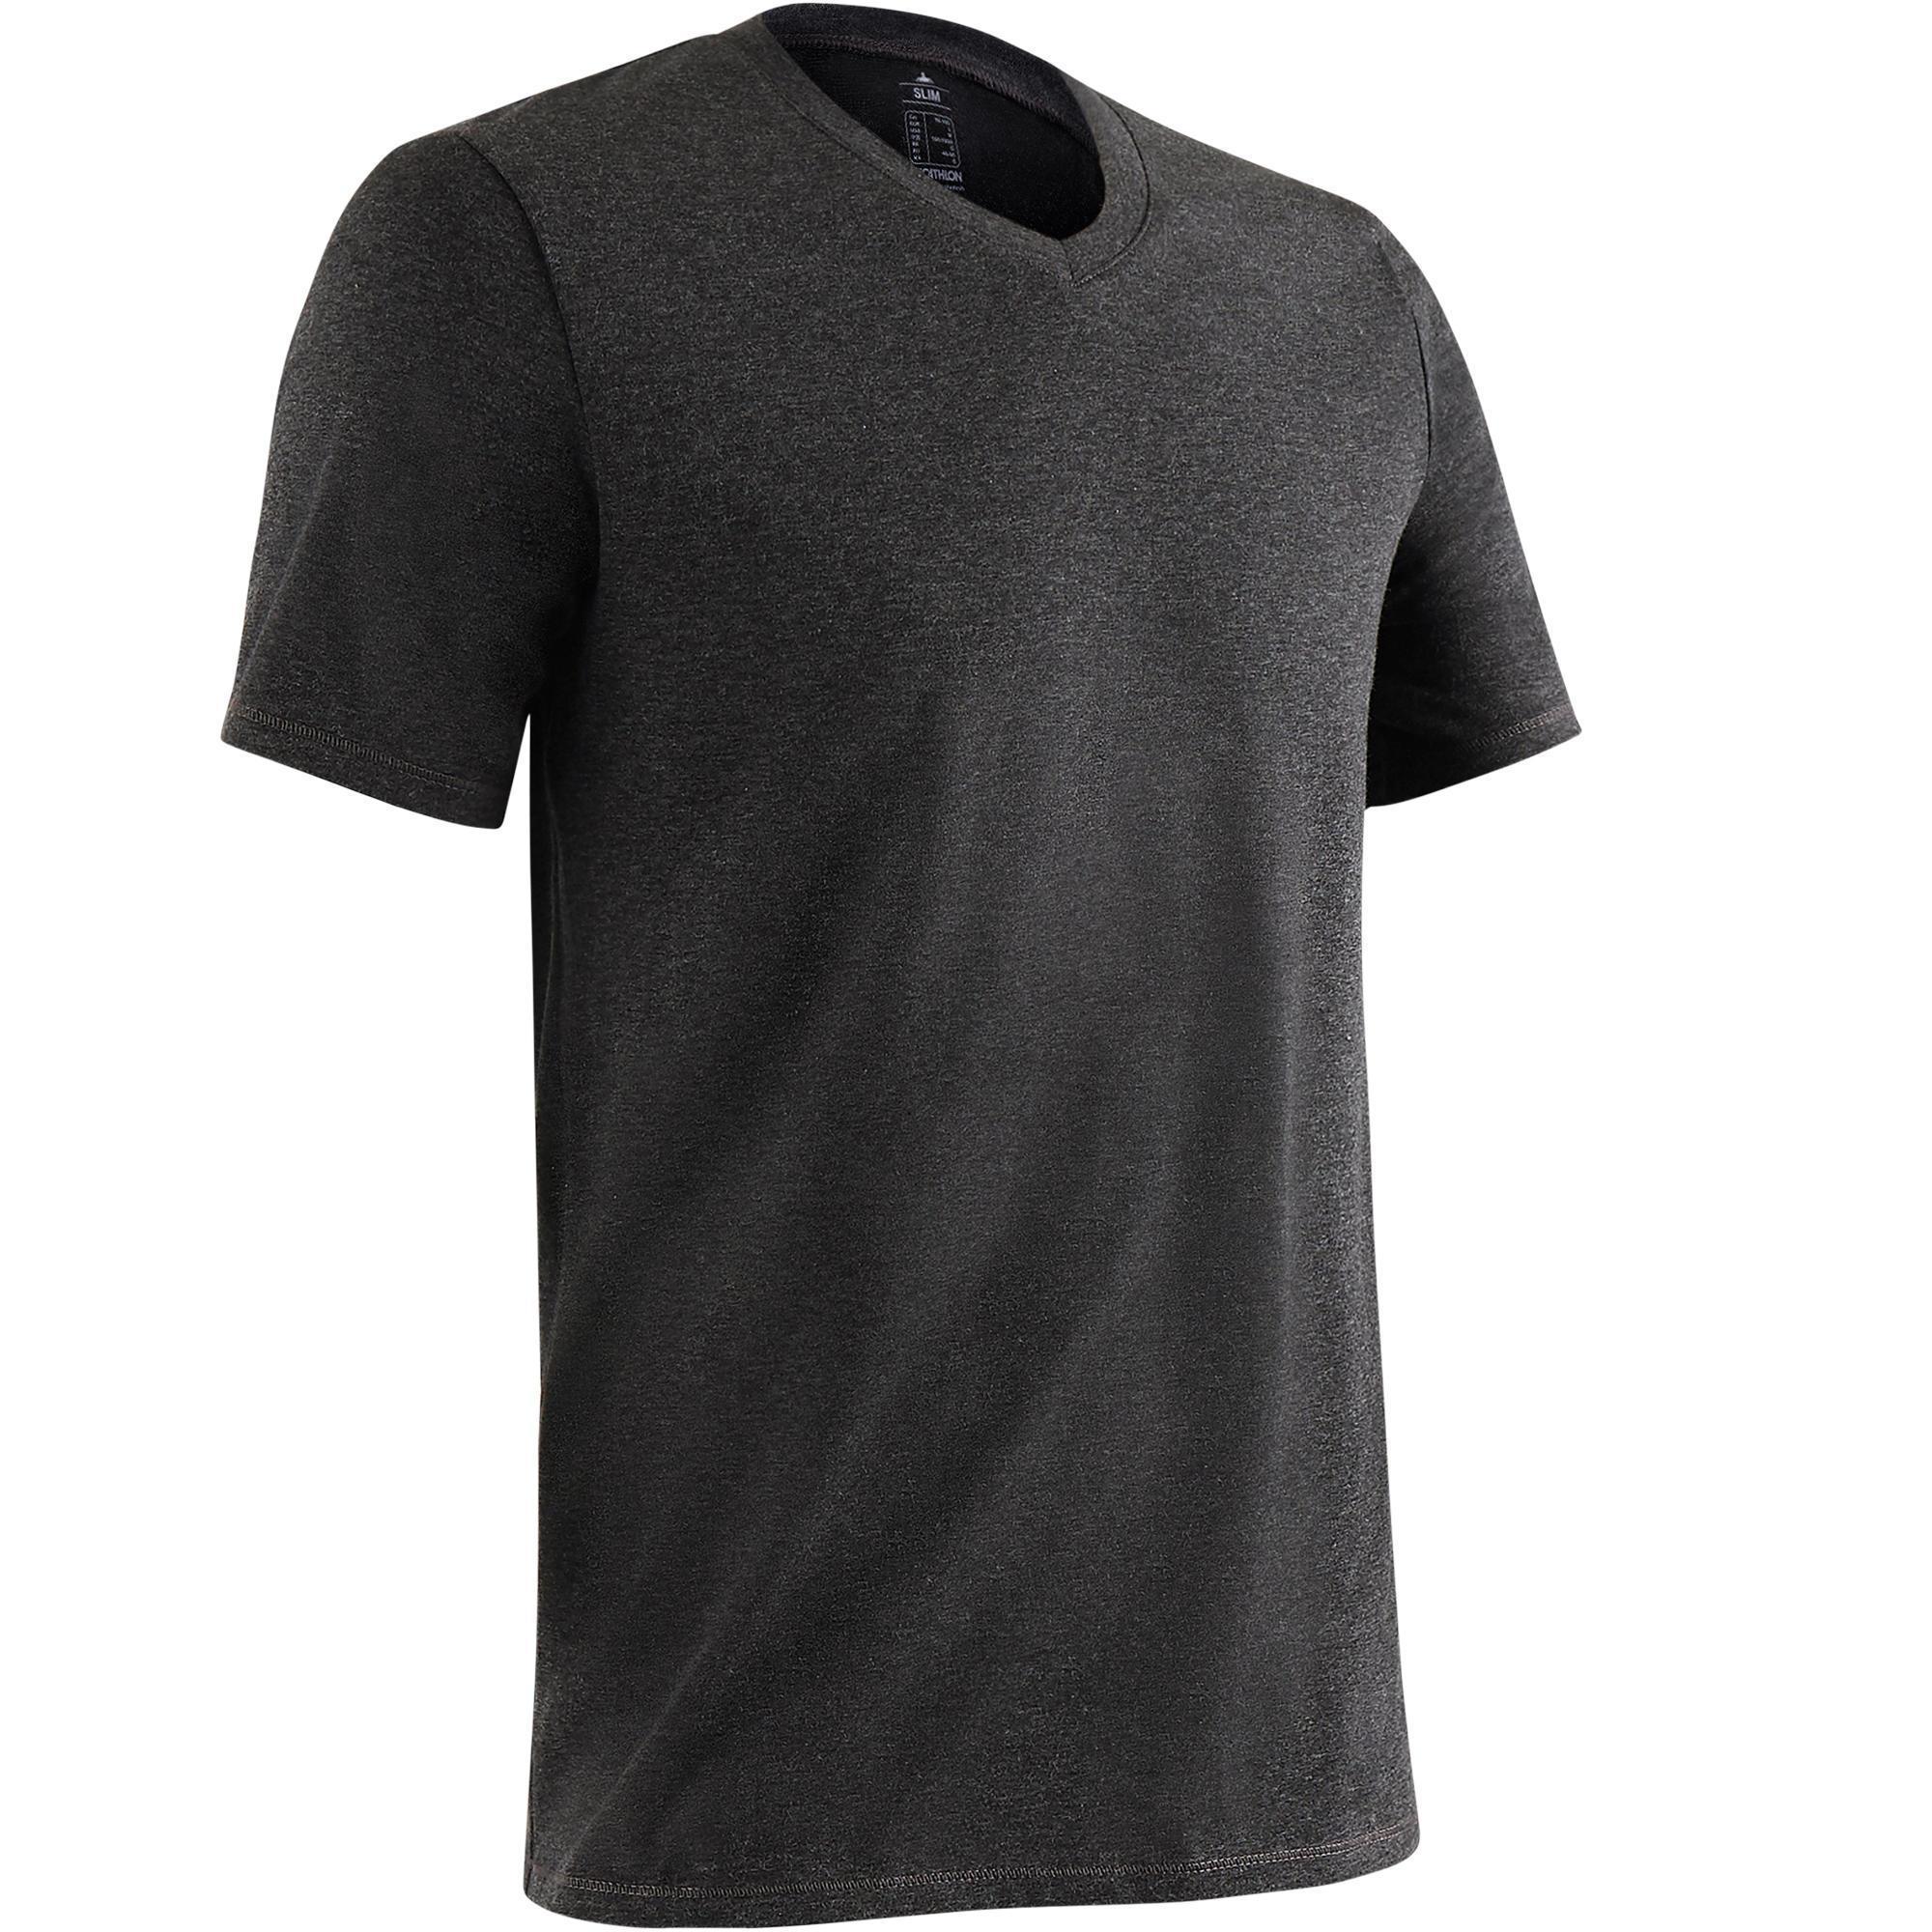 Domyos T-shirt 500 V-hals slim fit pilates en lichte gym heren kopen